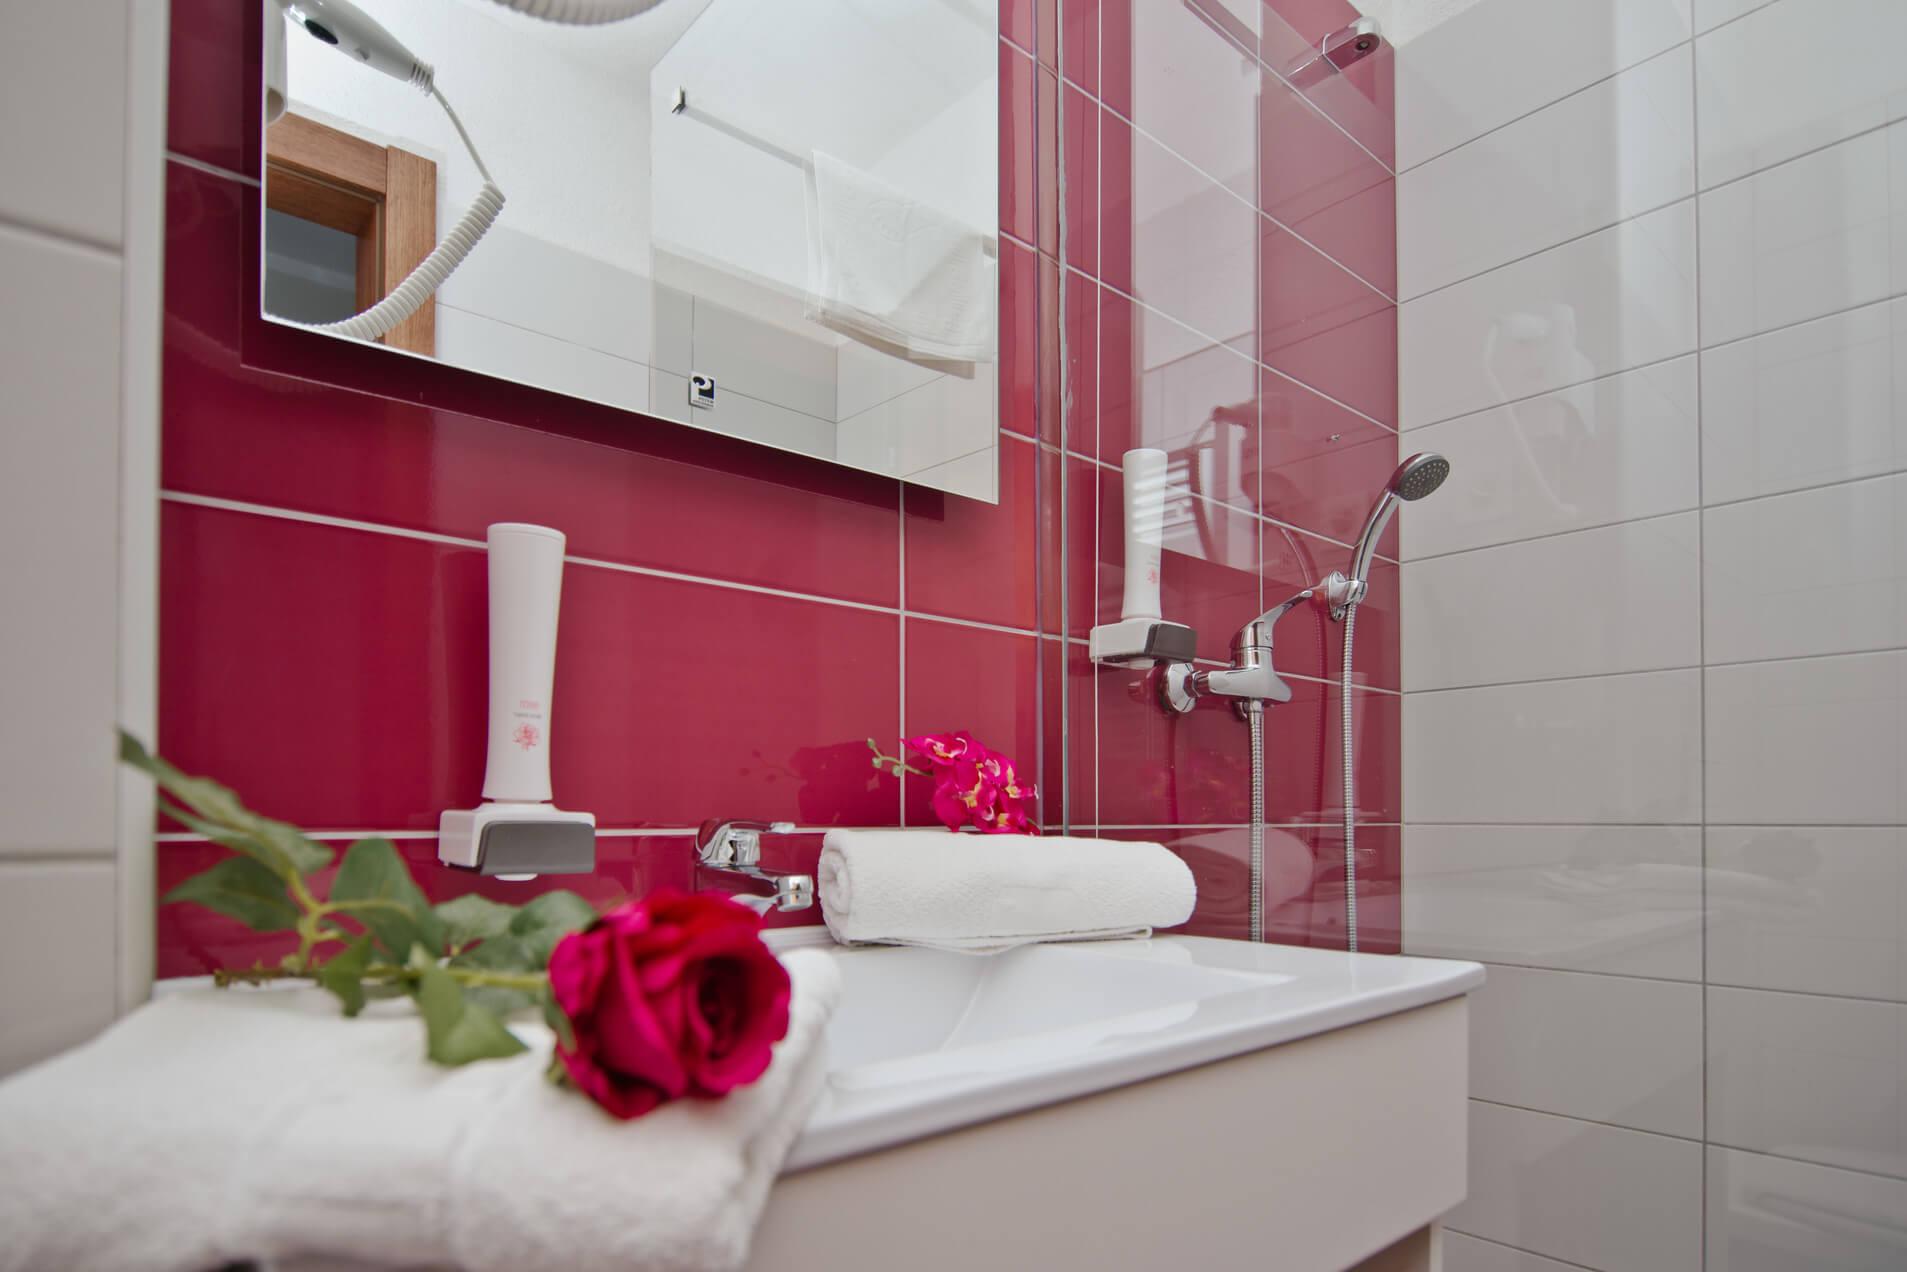 Kupaonica/Bathroom/Bagno